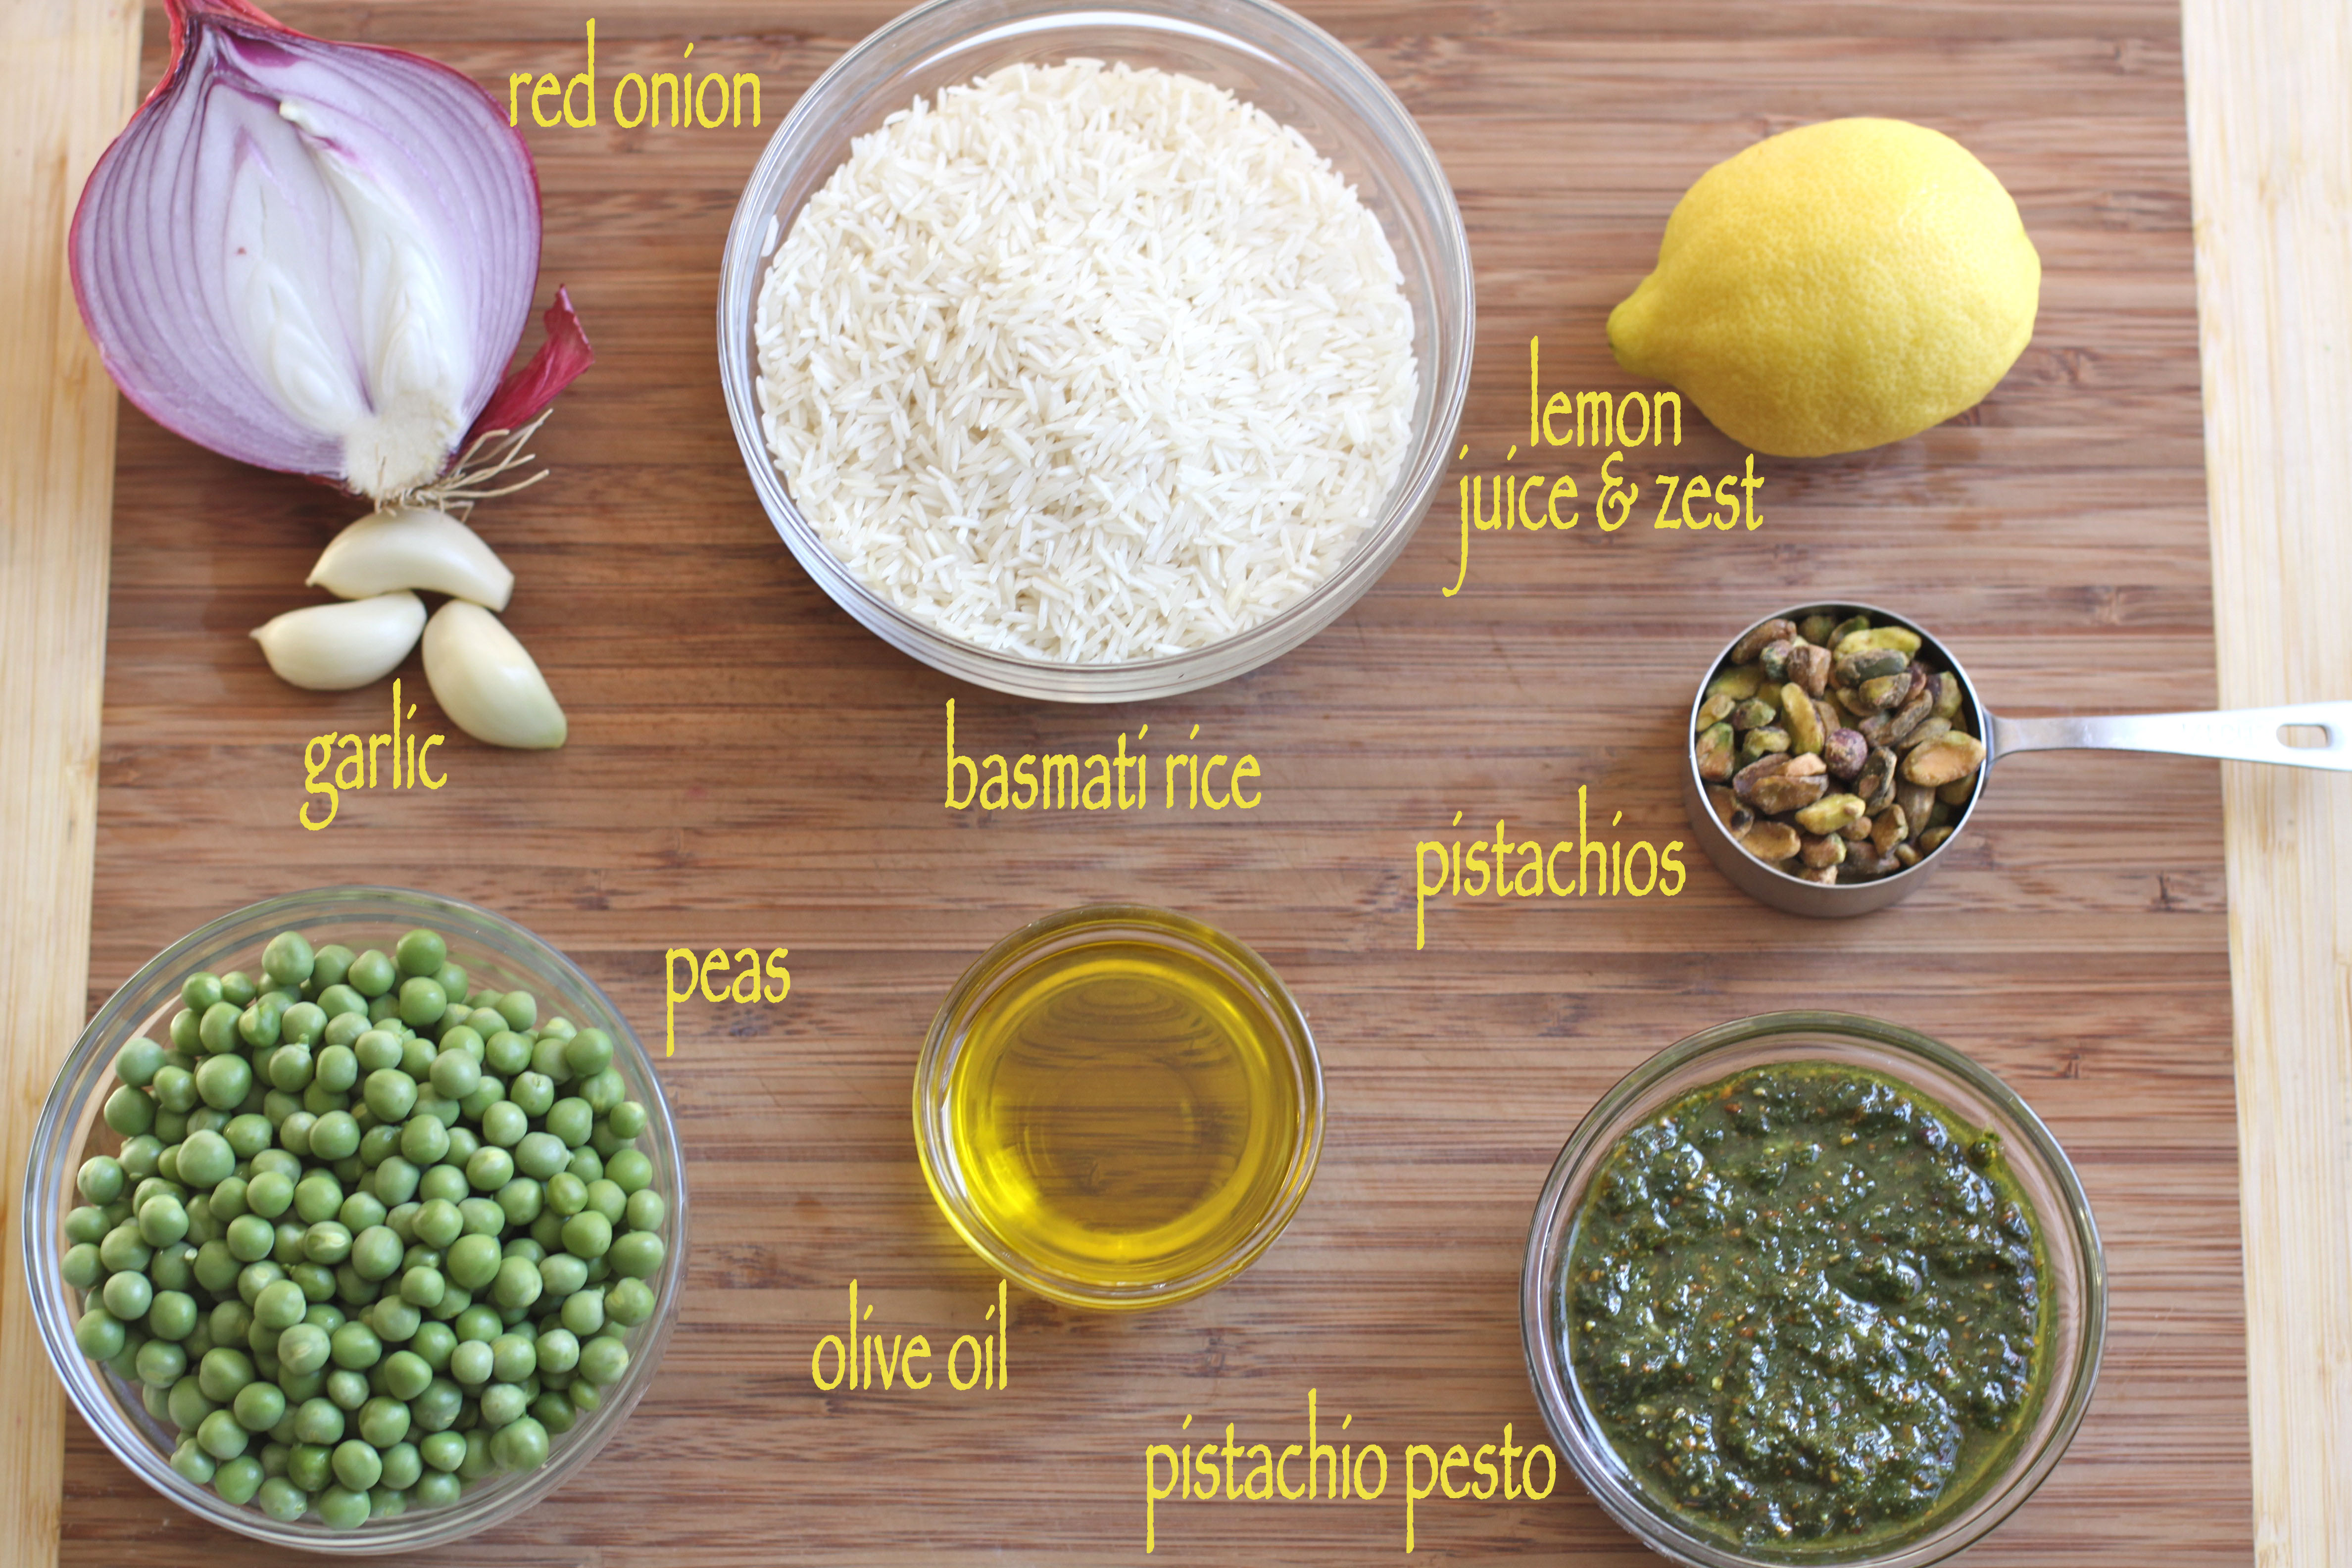 Basmati w/ Pistachio Pesto & Peas